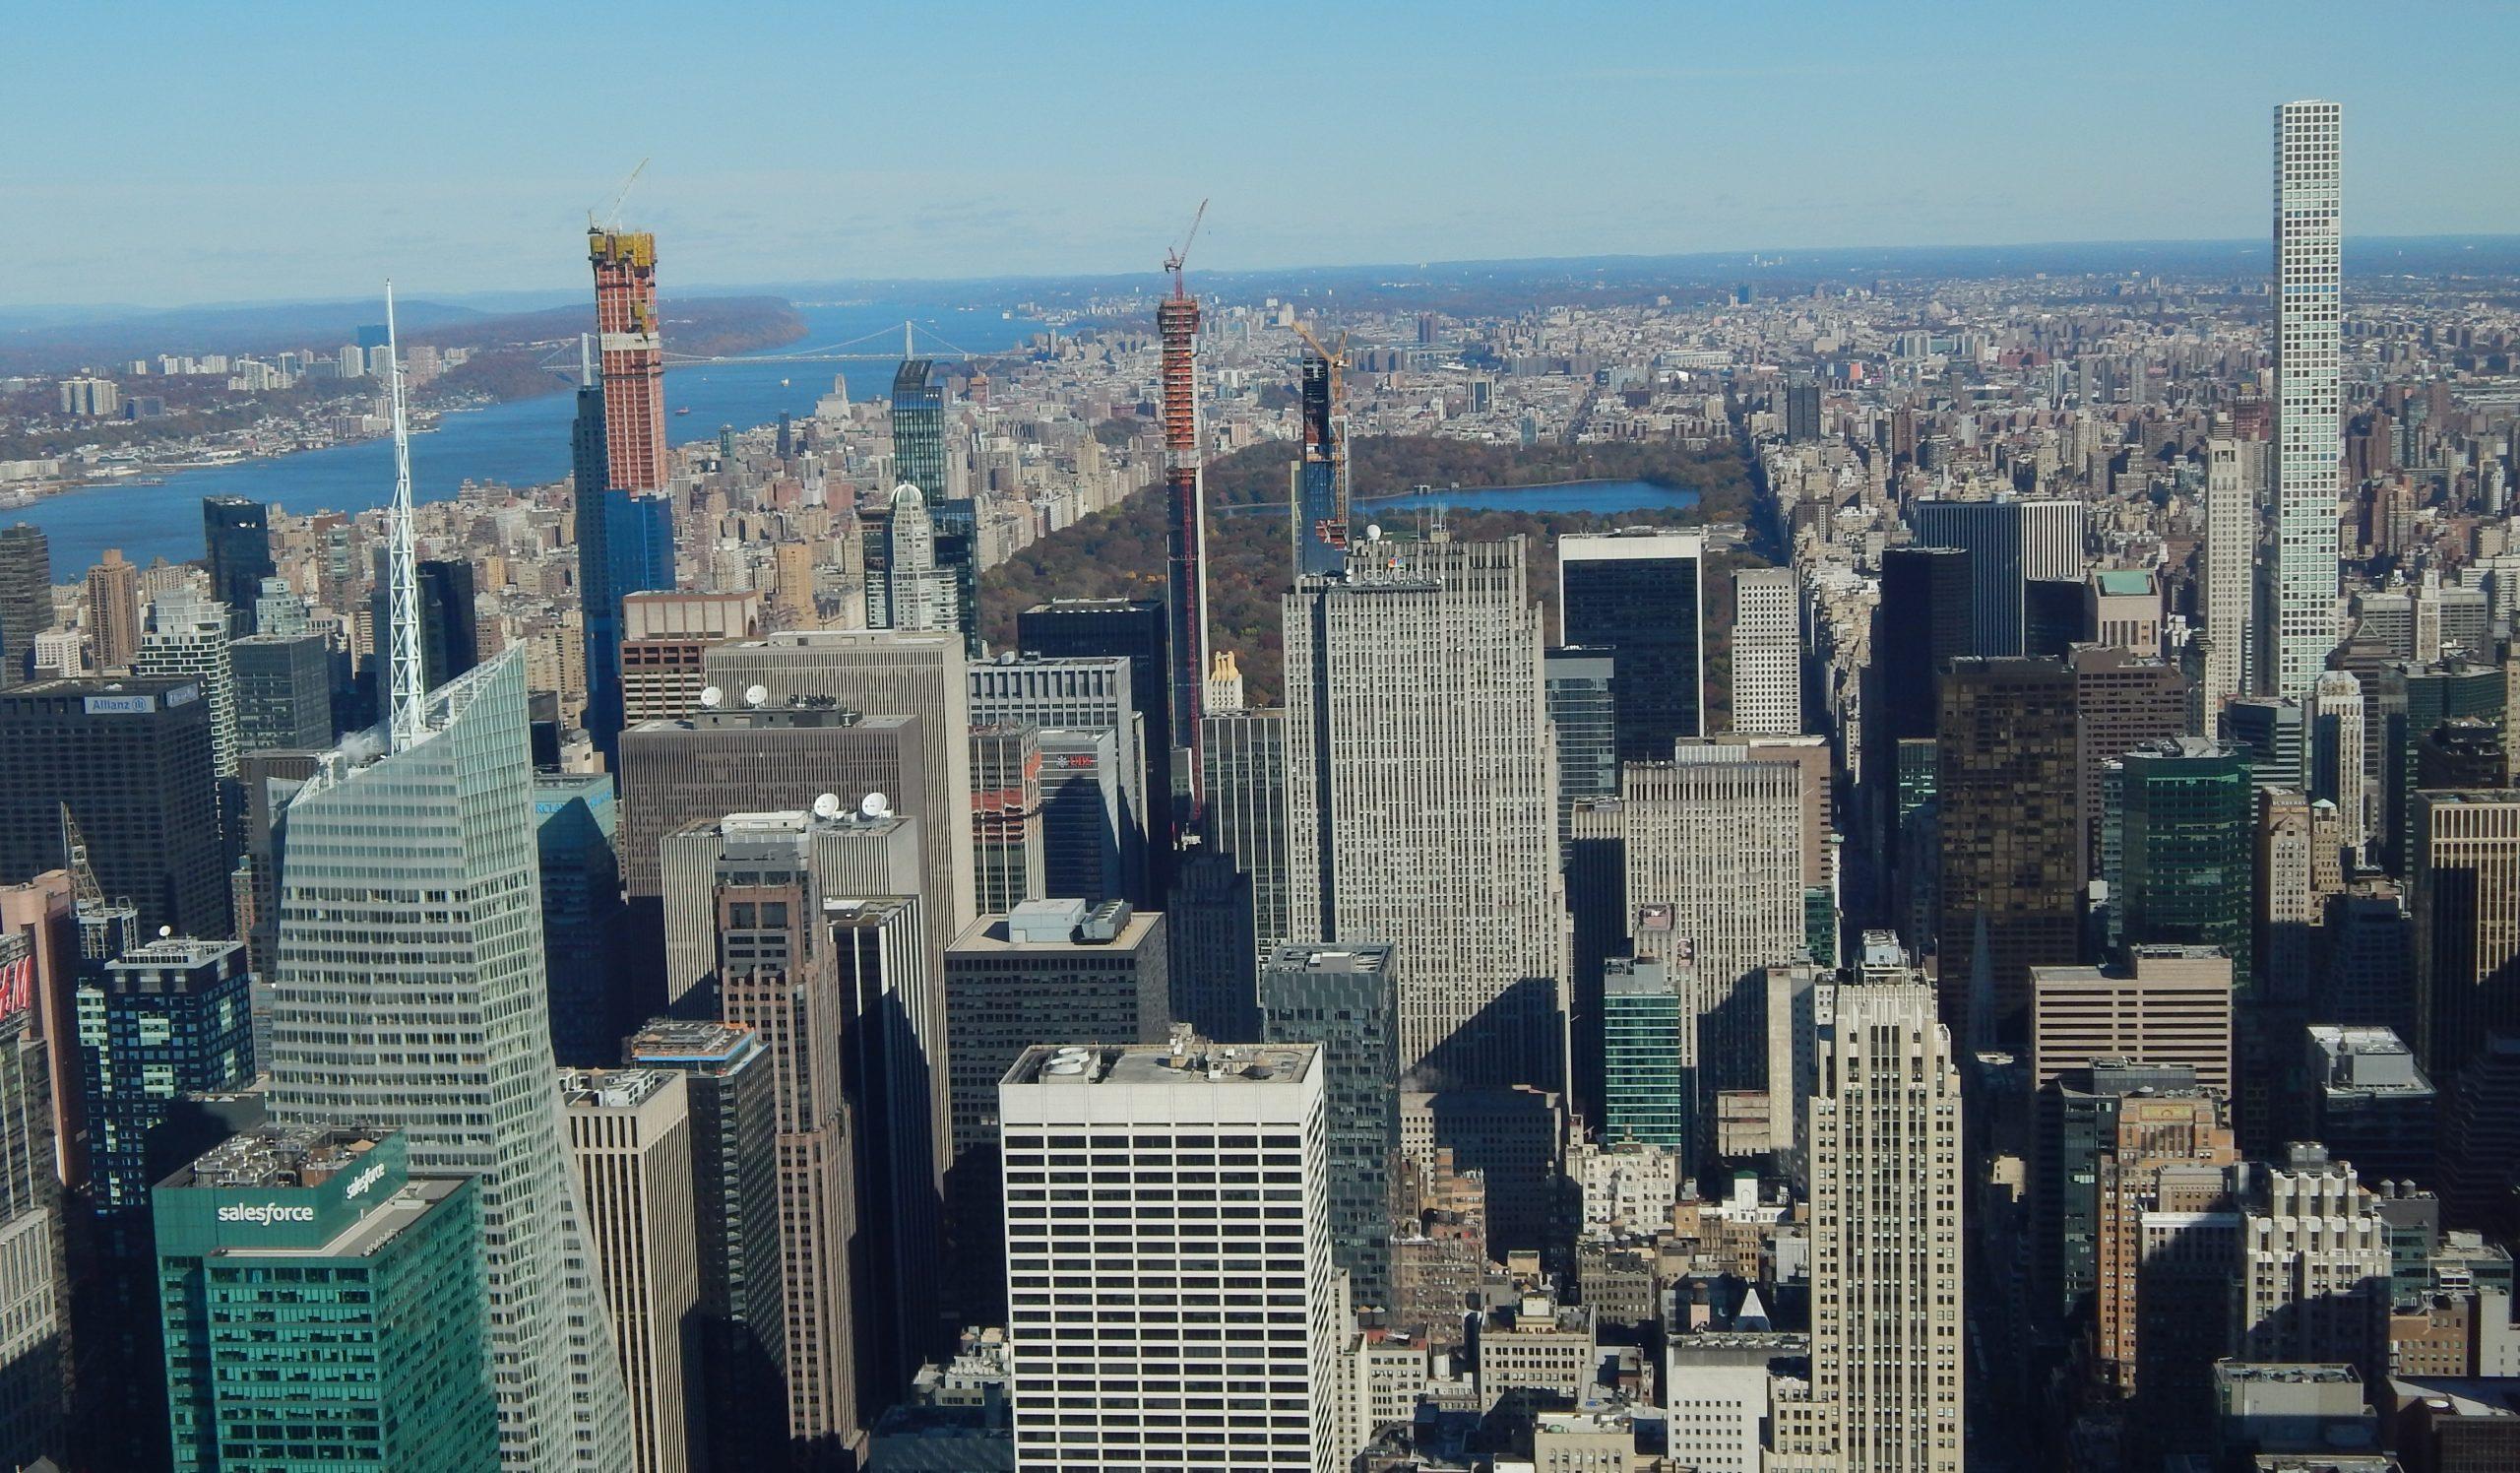 The most impressive New York skyscrapers